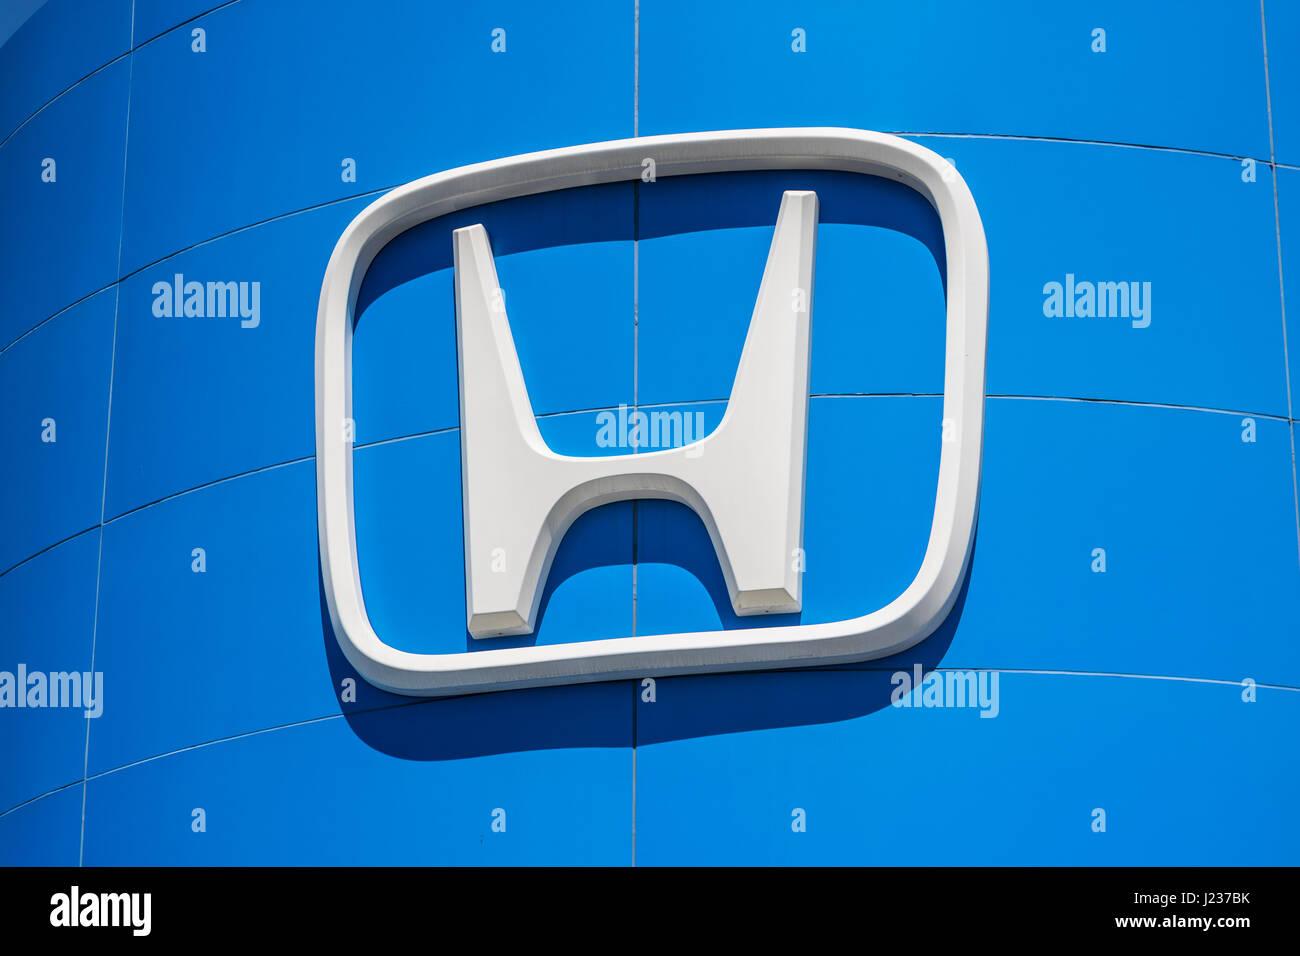 honda fit stock photos  u0026 honda fit stock images